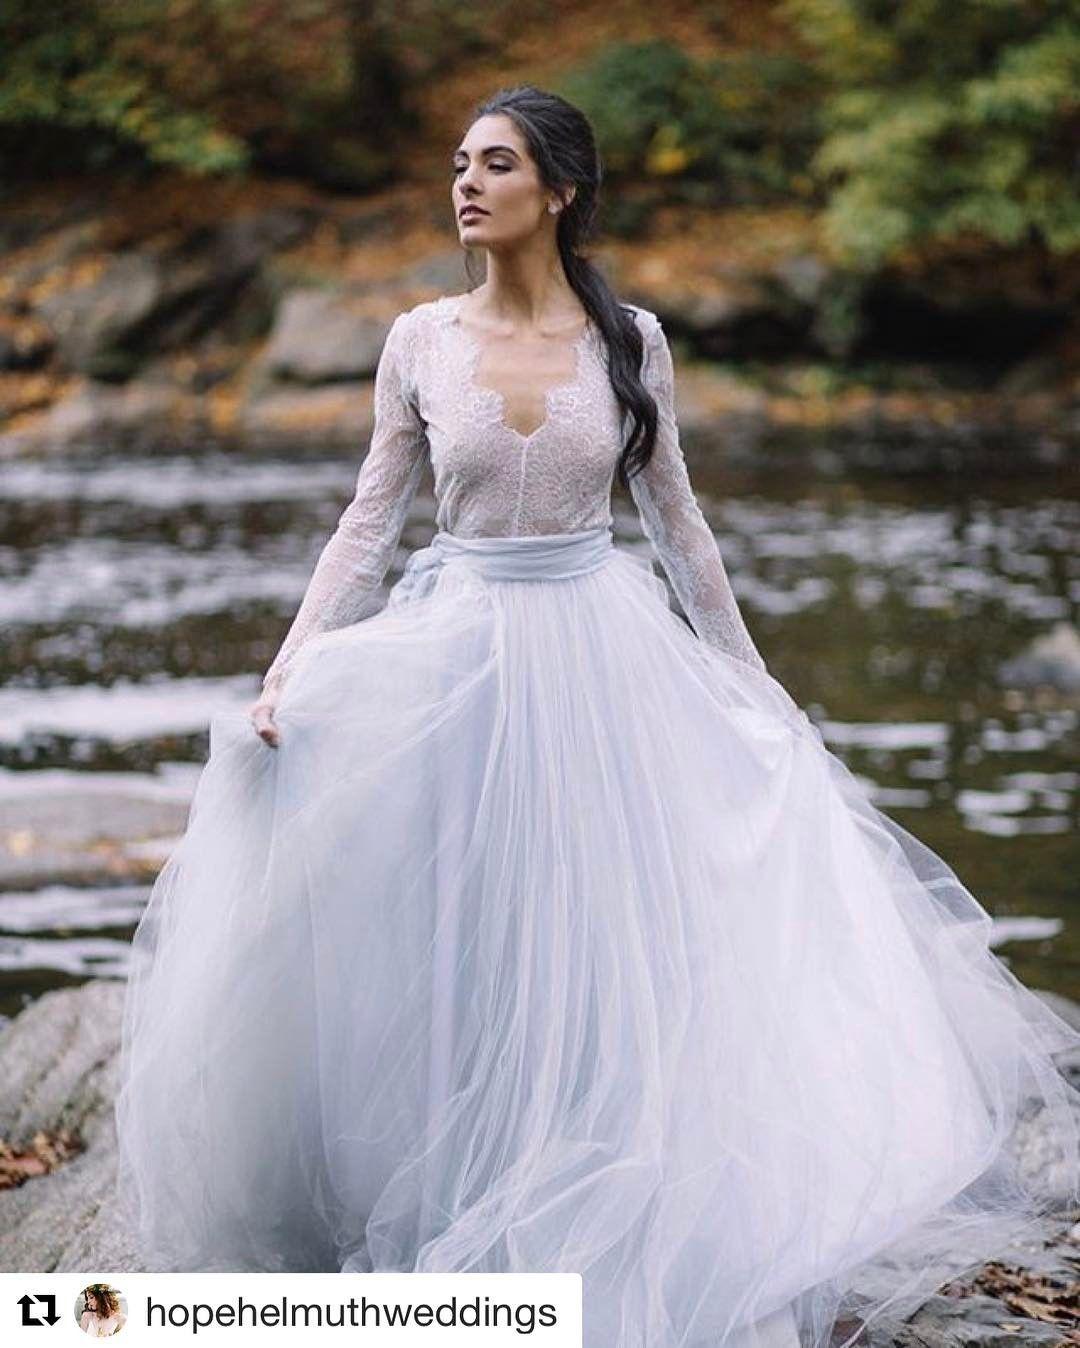 Non Traditional Wedding Dress. 👍👌 #weddingdresses